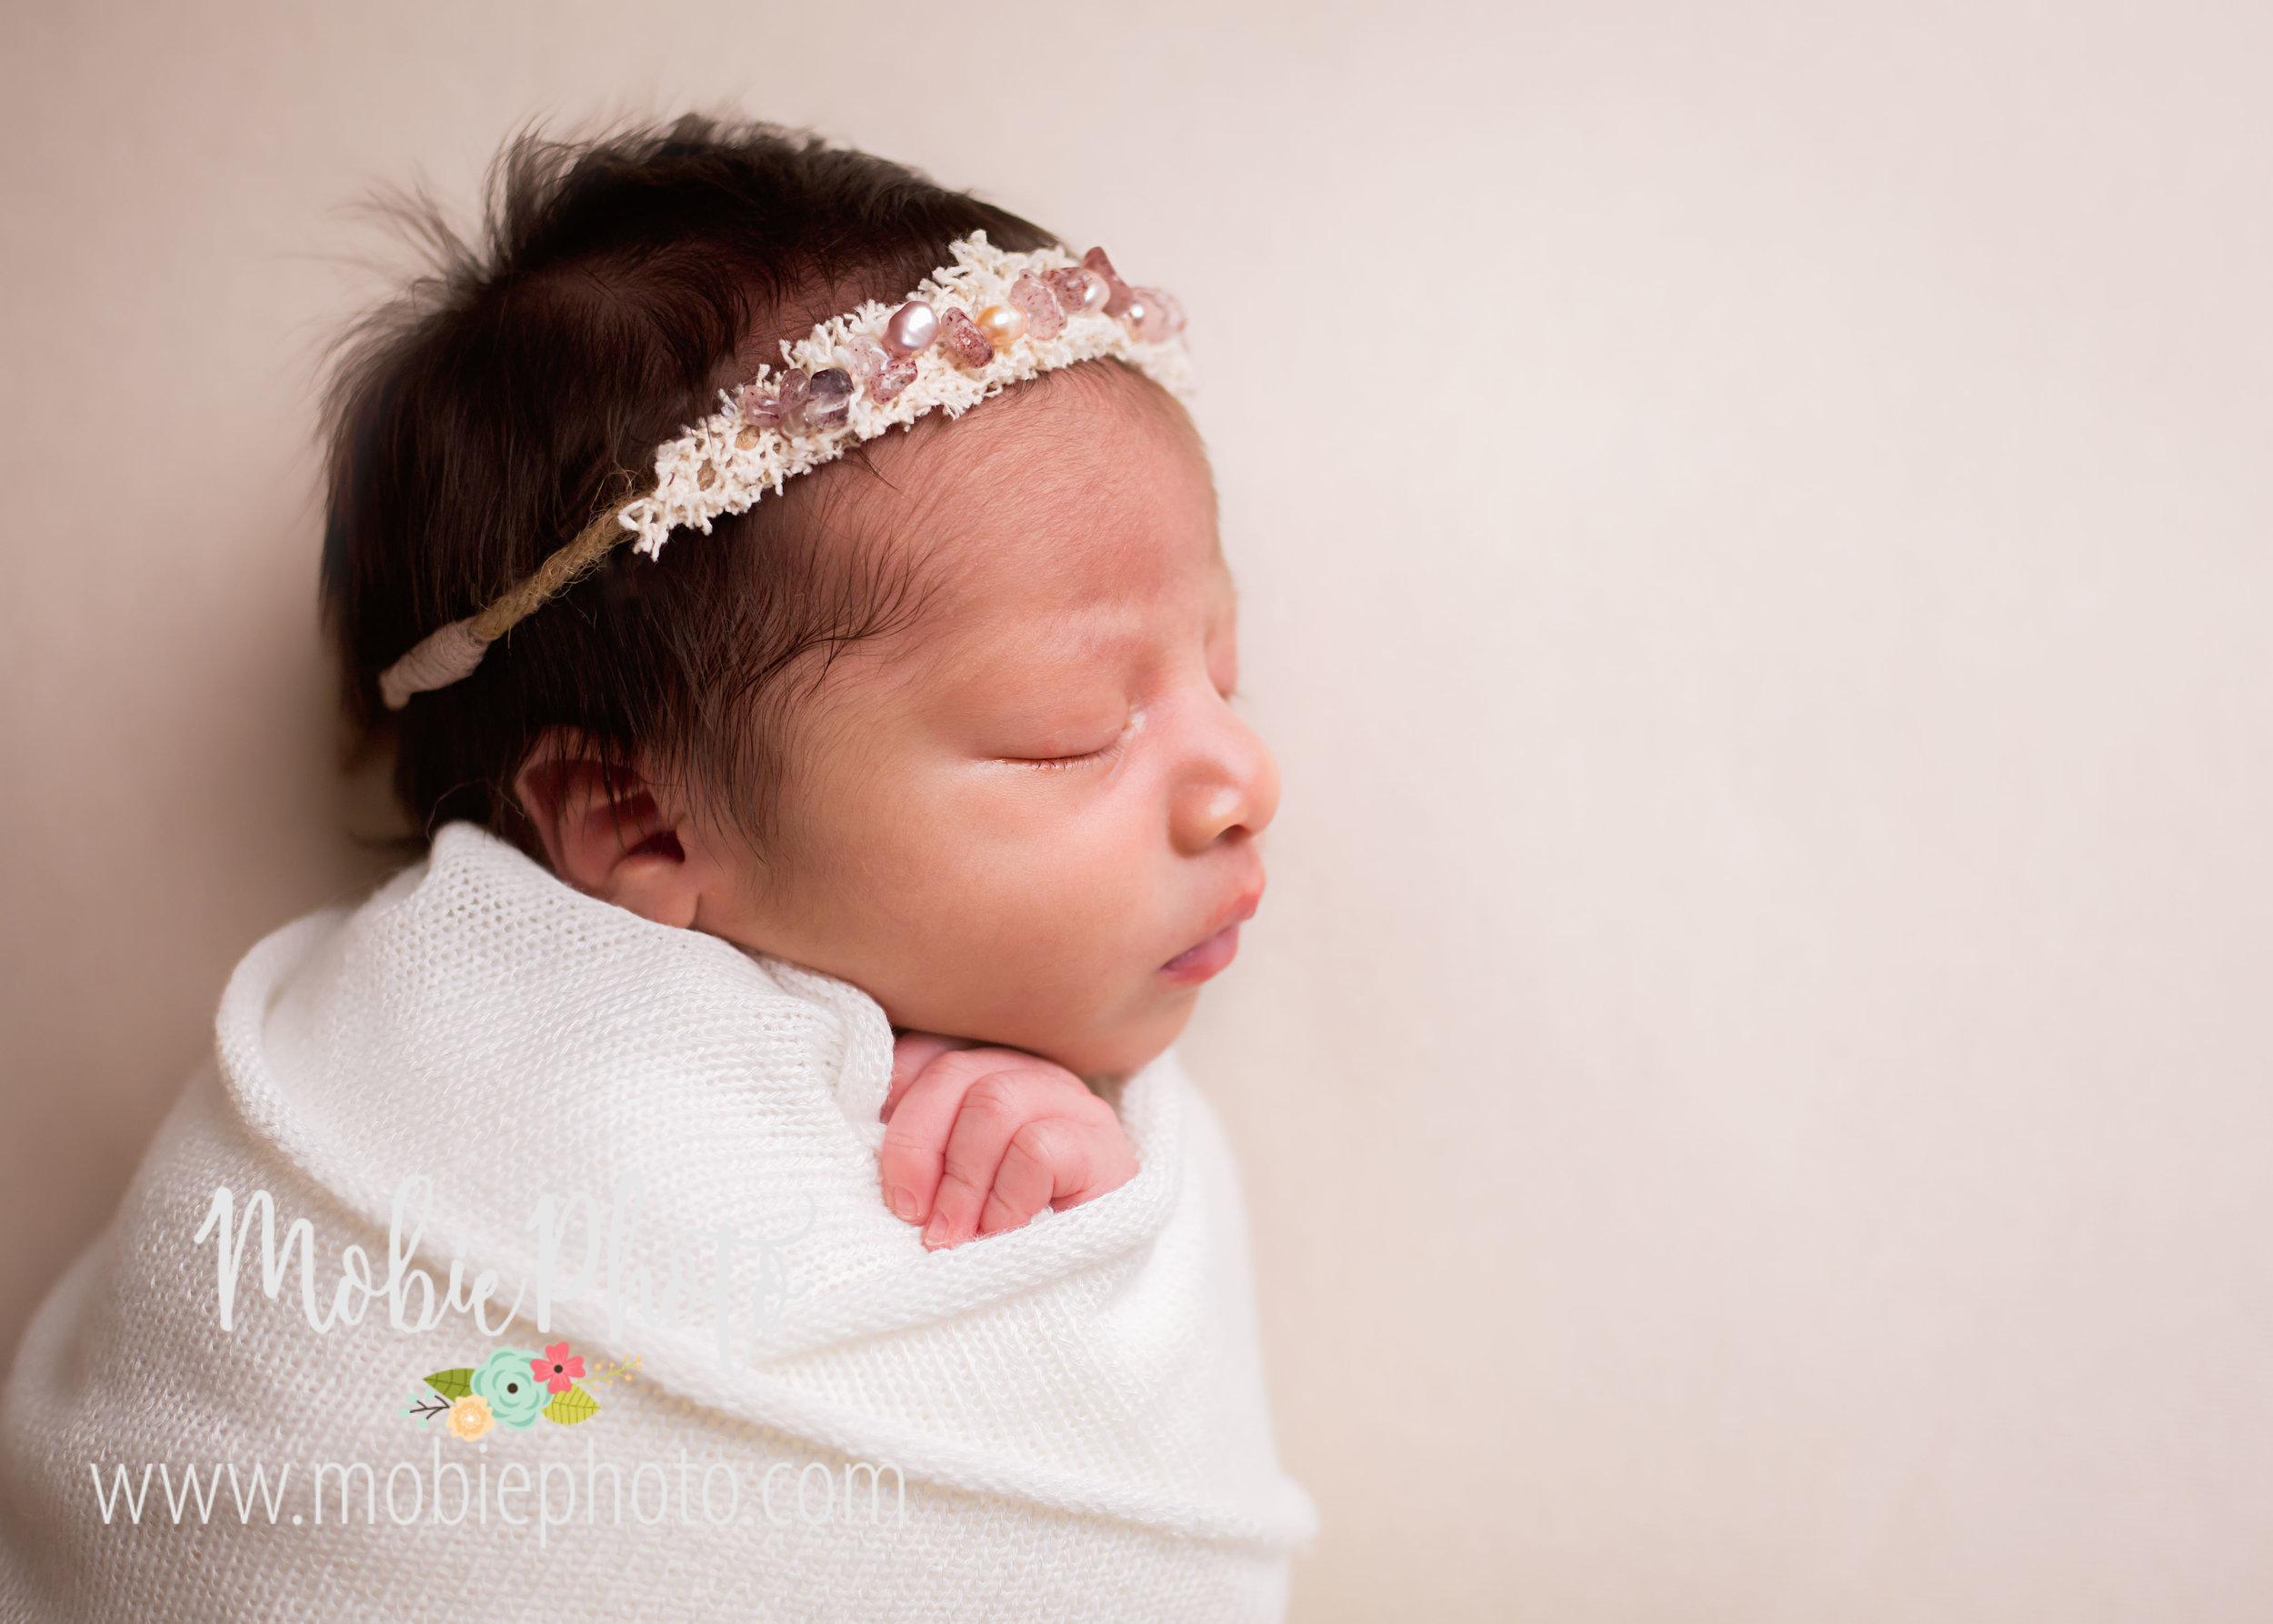 Newborn Mini Session - Mobie Photo - Utah Newborn Photography